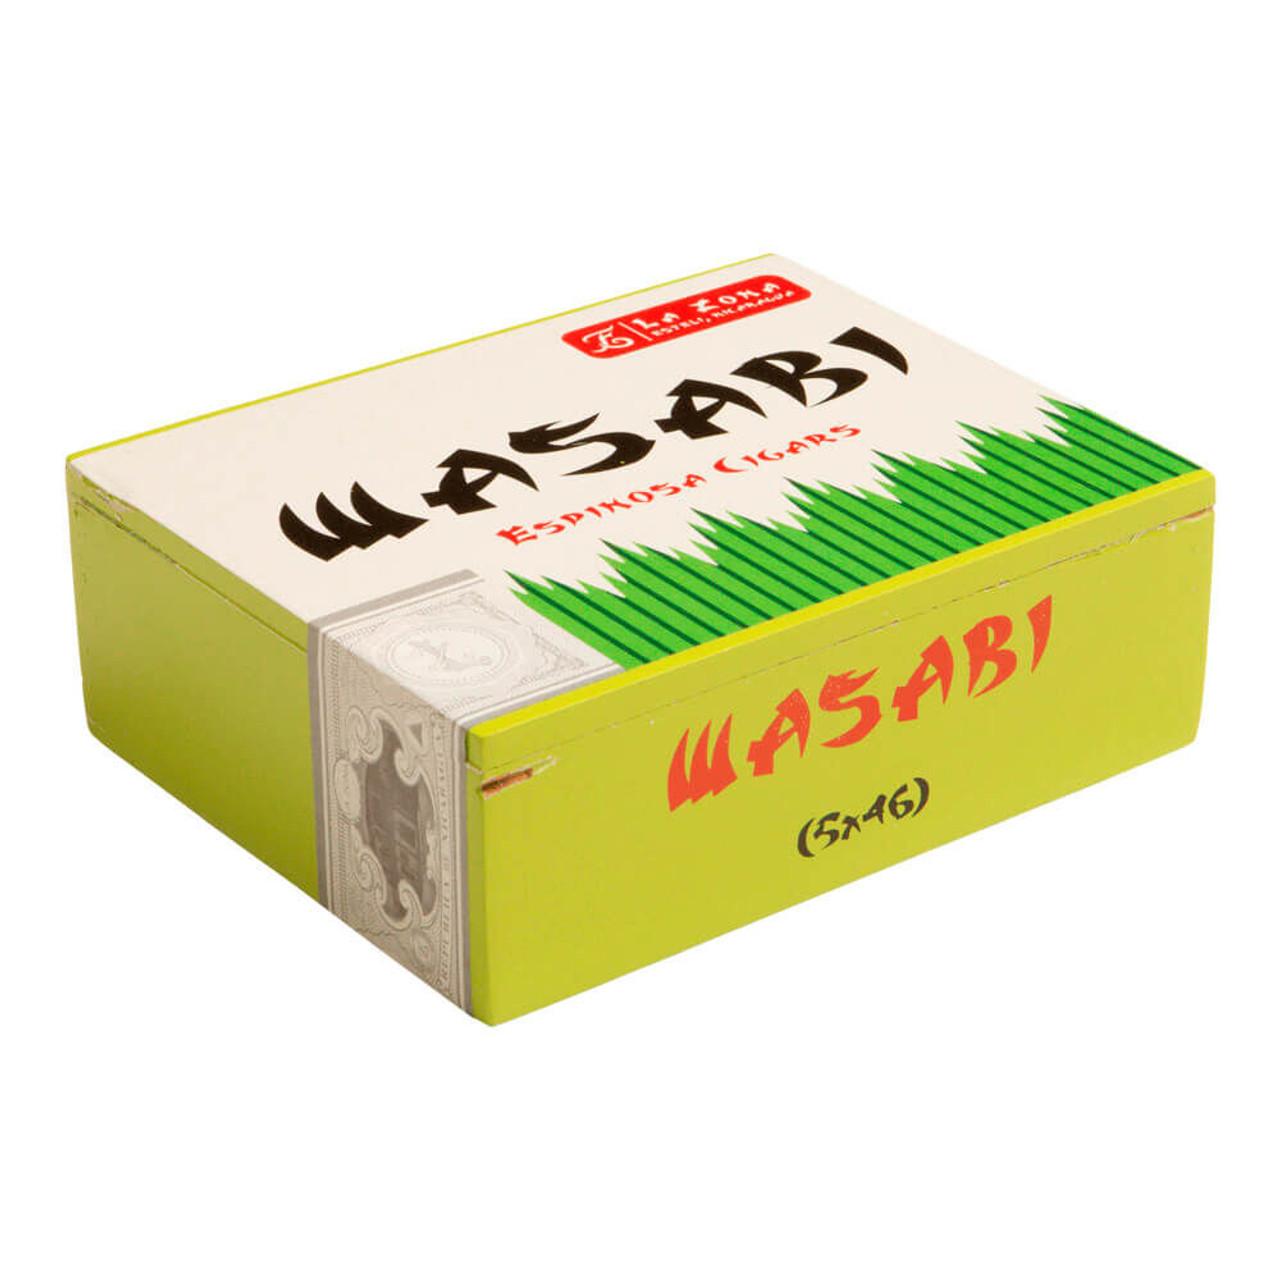 Espinosa Wasabi Corona Candela Cigars - 5.0 x 46 (Box of 10)